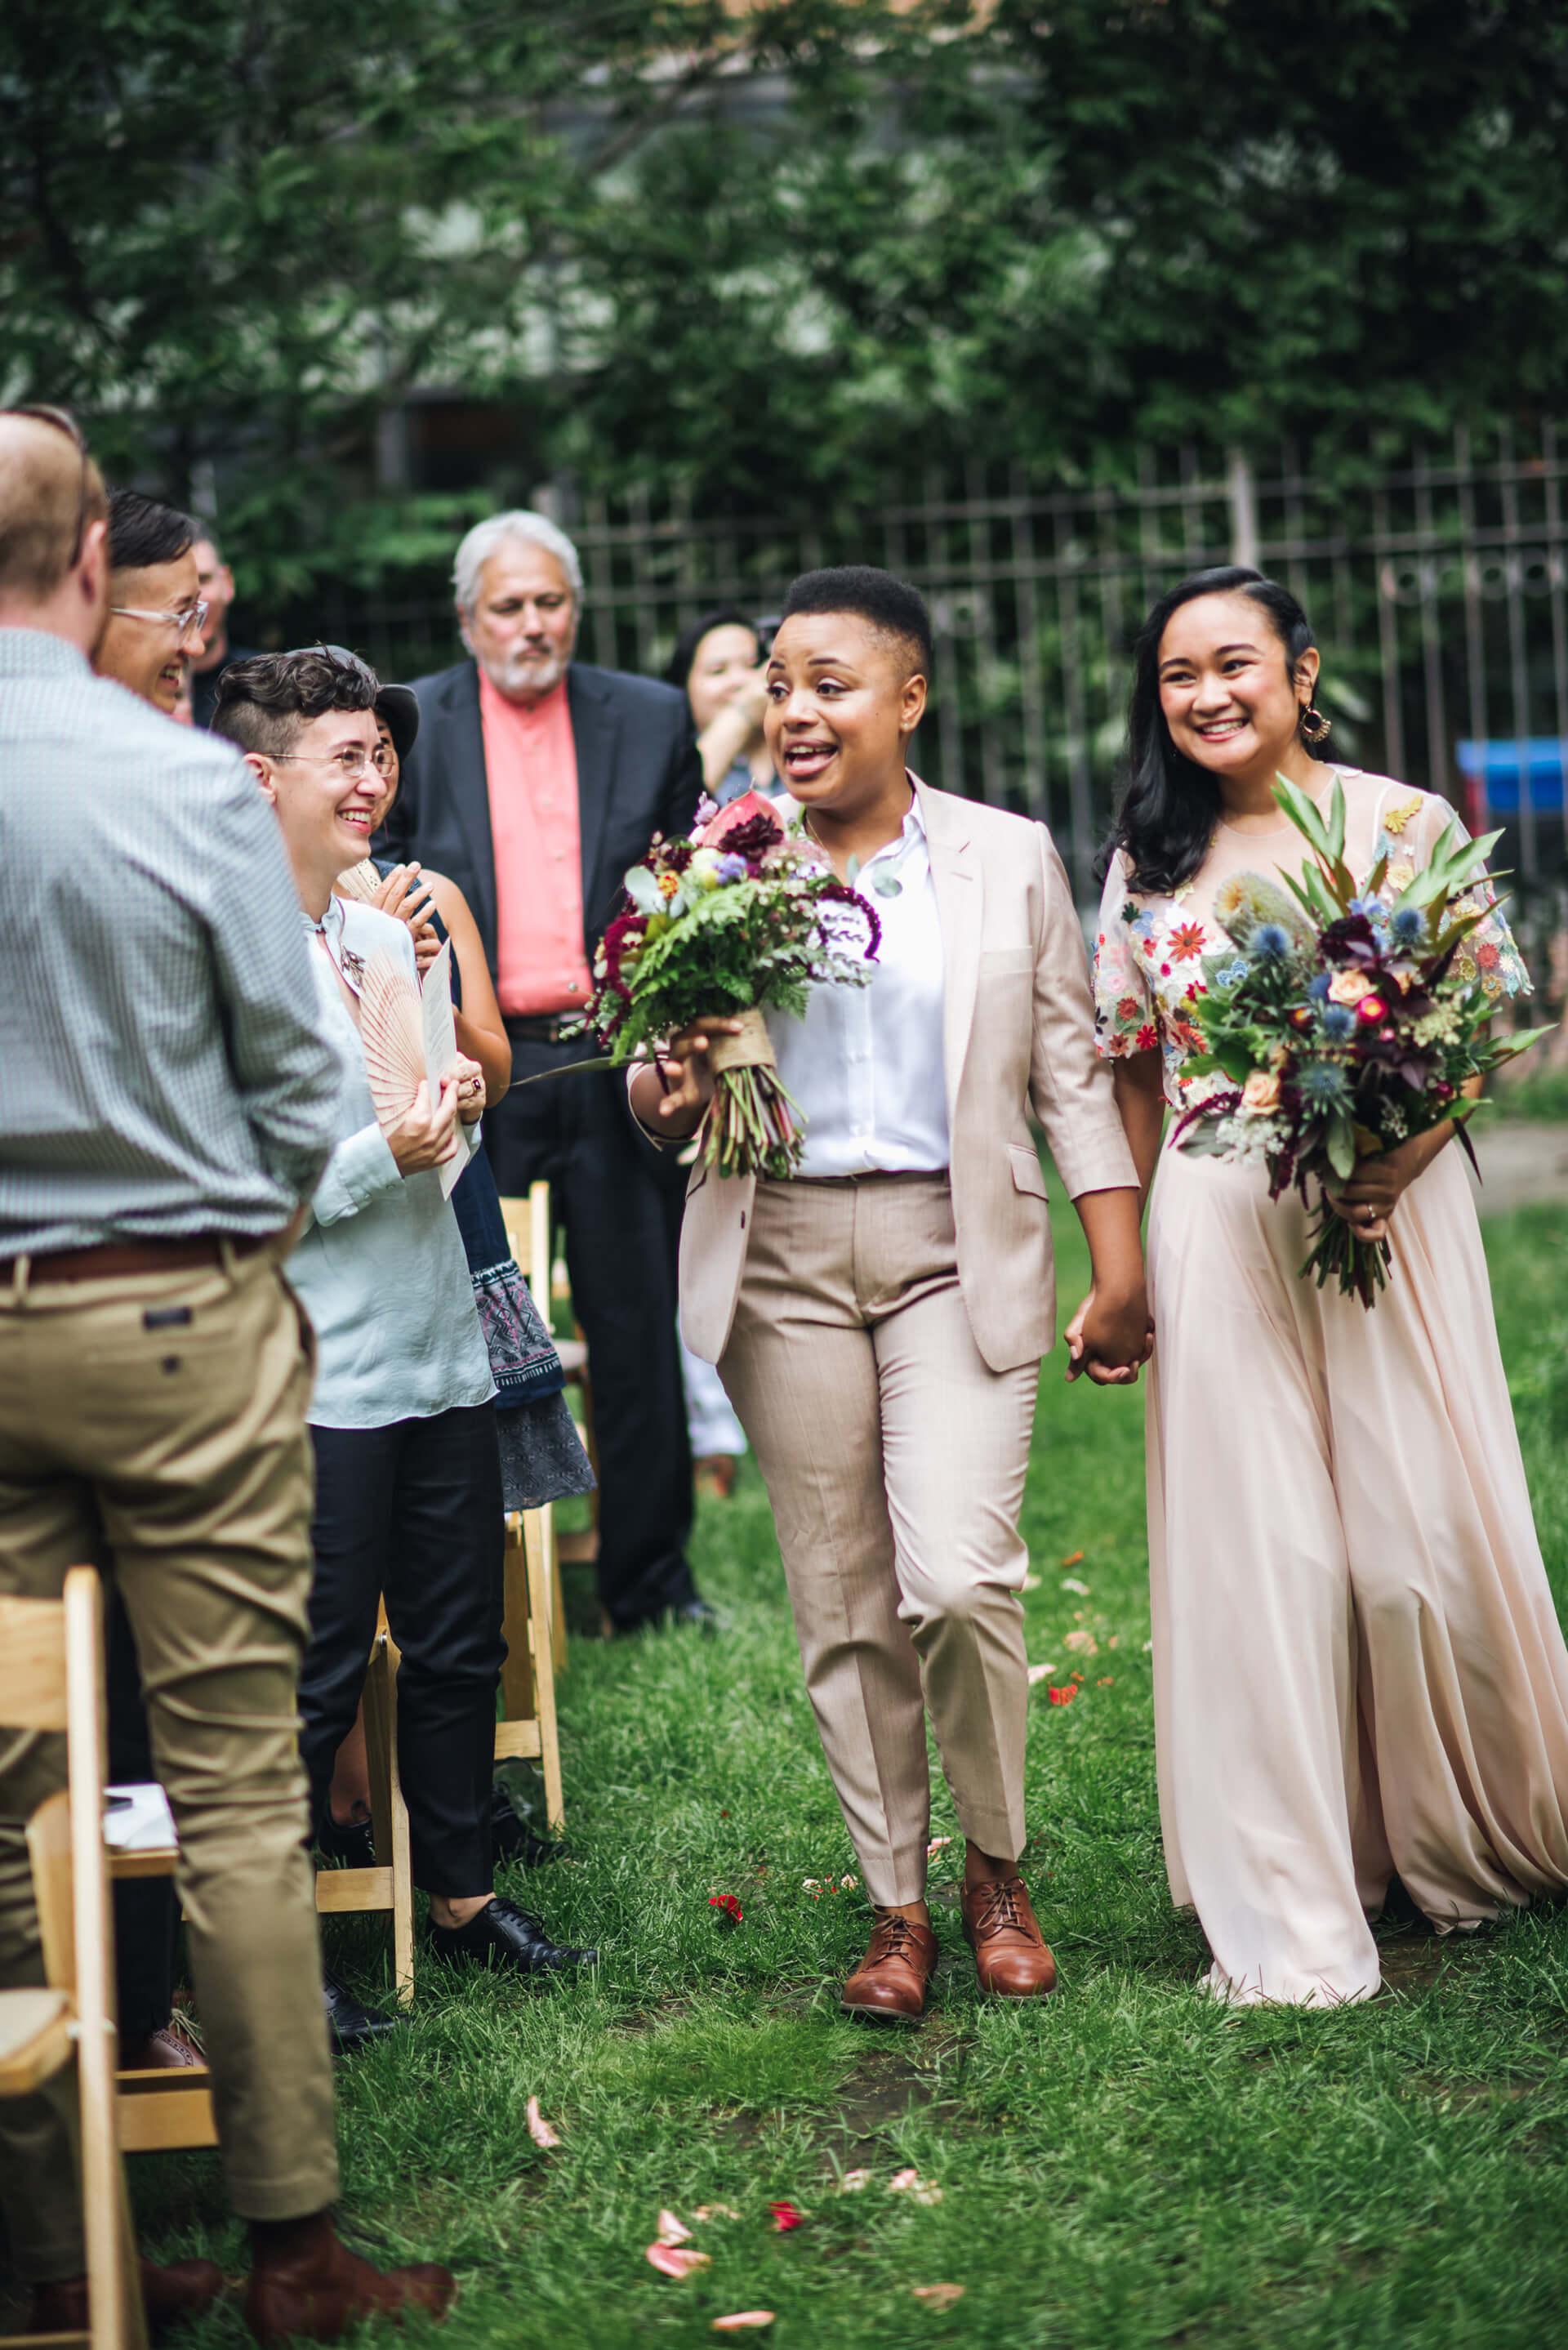 BROOKLYN SOCIETY FOR ETHICAL CULTURE - INTIMATE WEDDING - CHI-CHI ARI-222.jpg